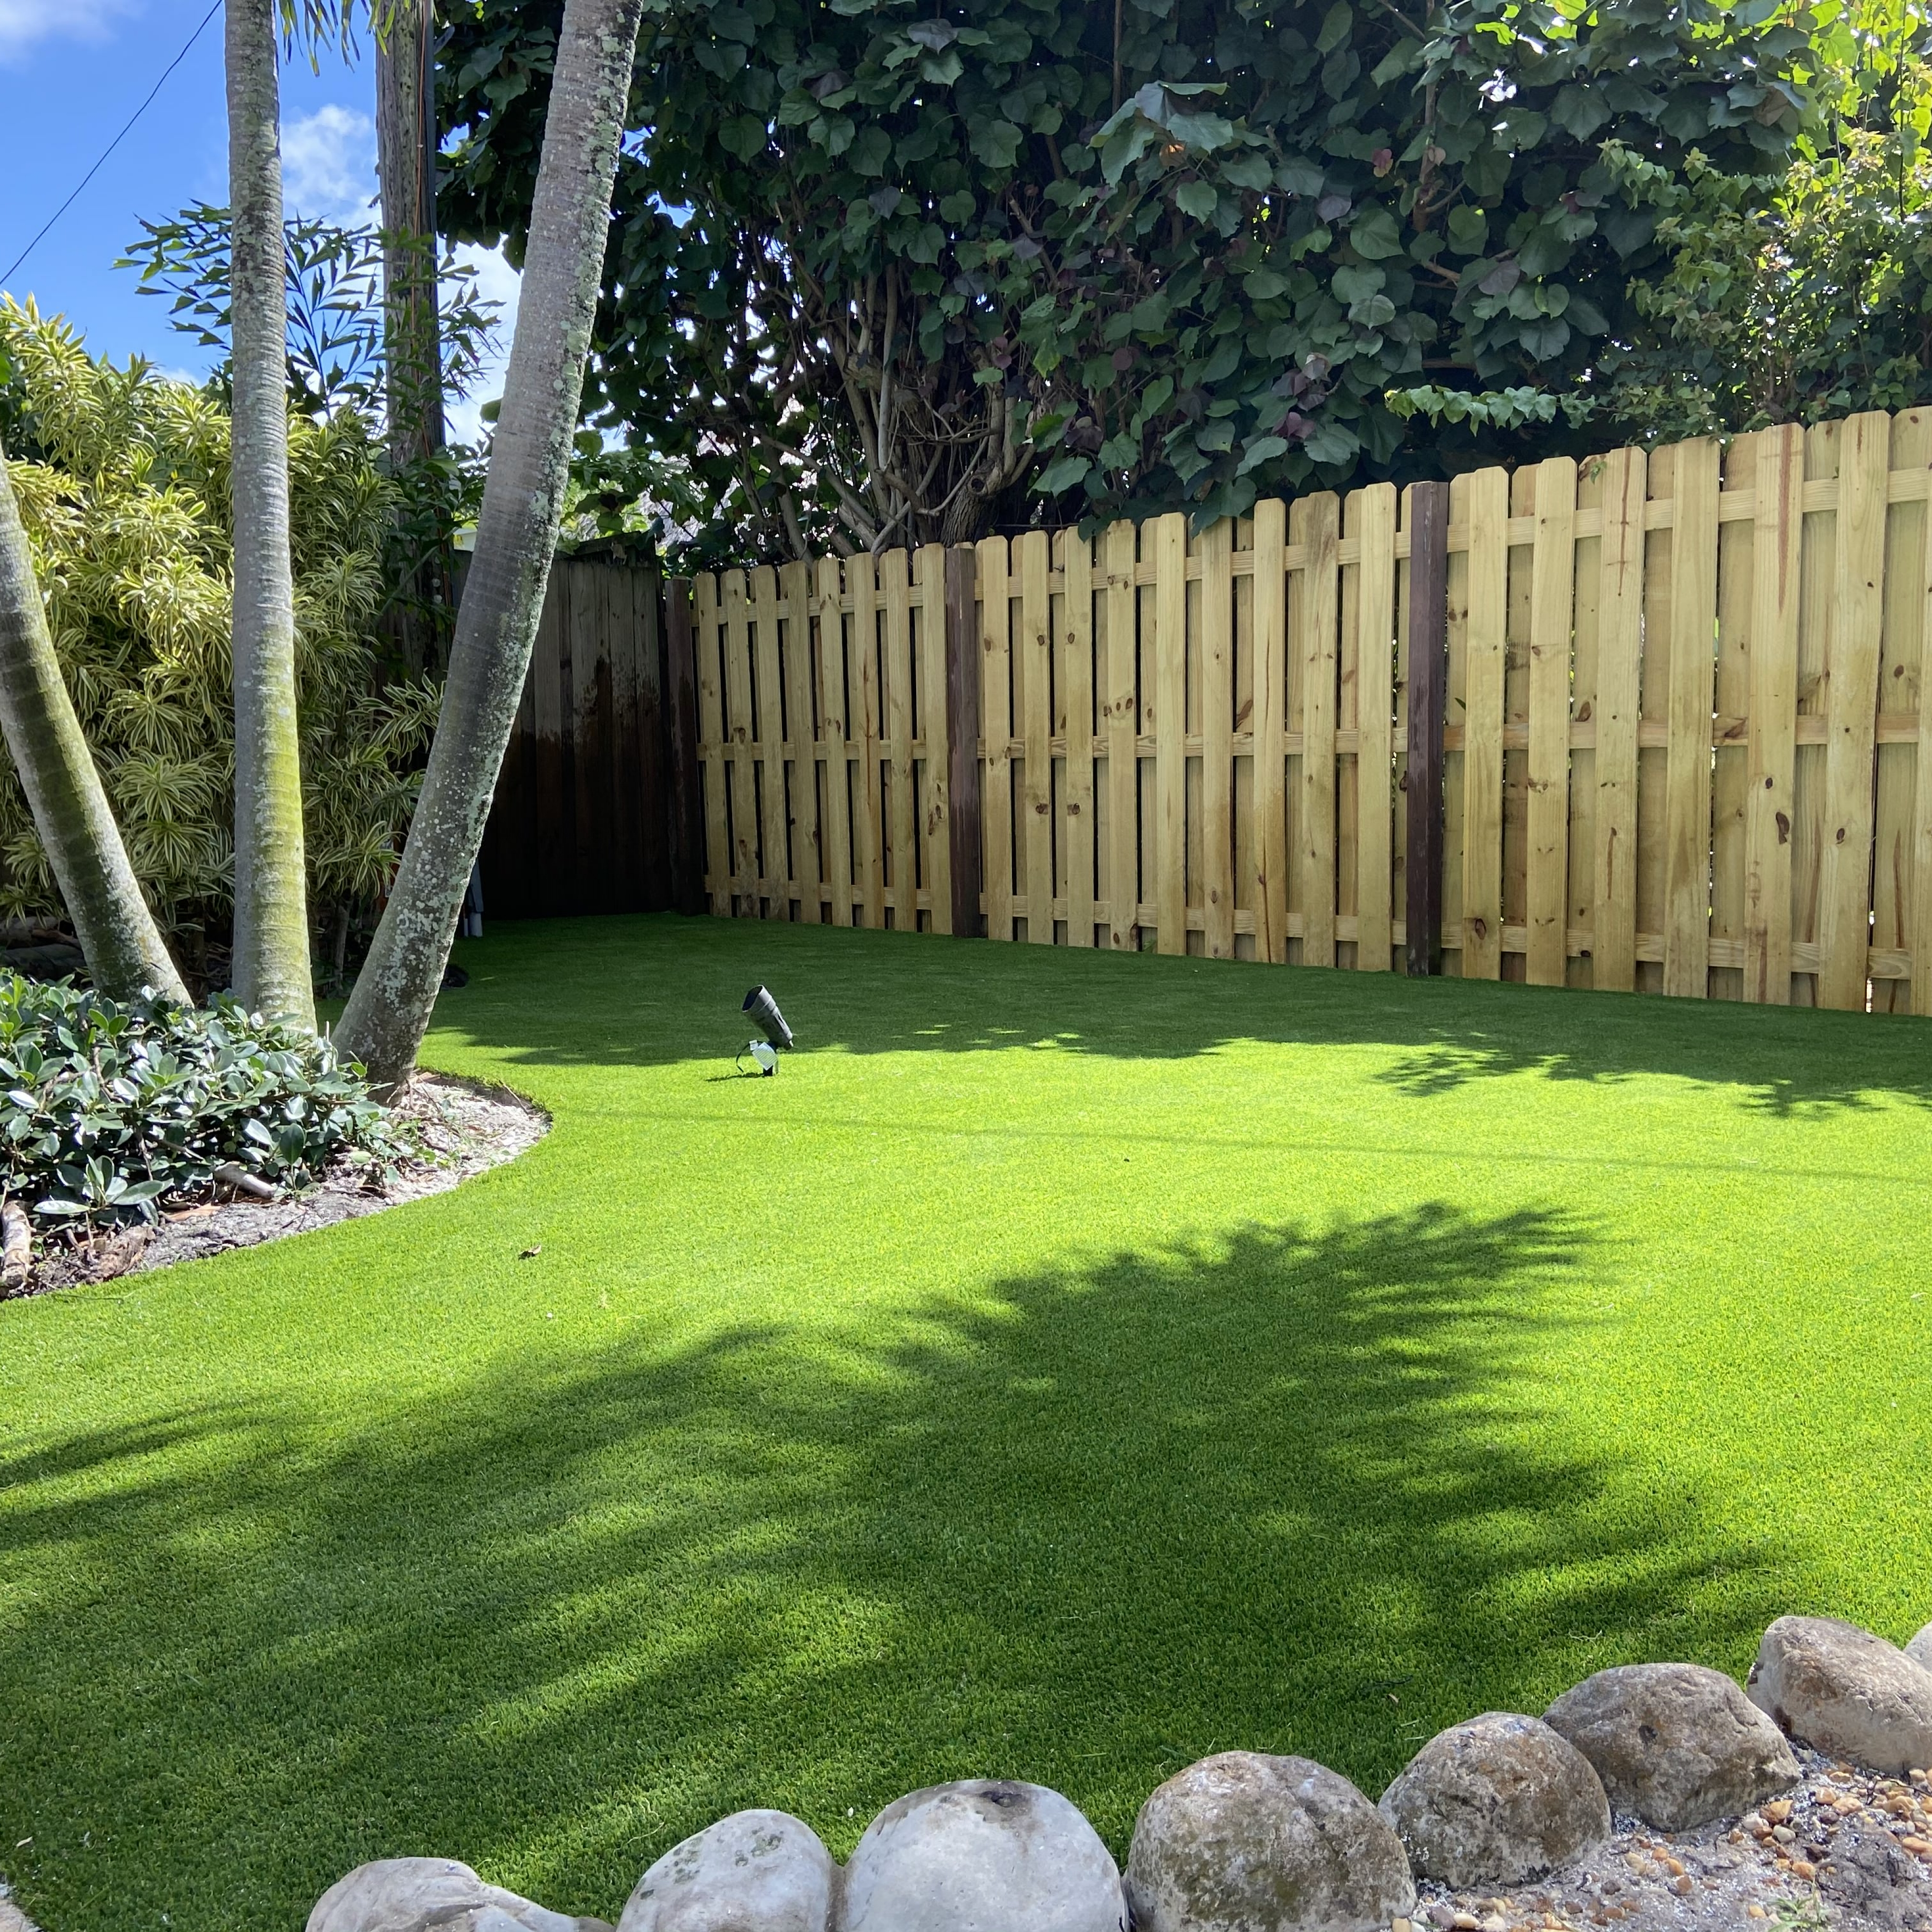 Spring-50 artificial lawn,synthetic lawn,fake lawn,turf lawn,fake grass lawn